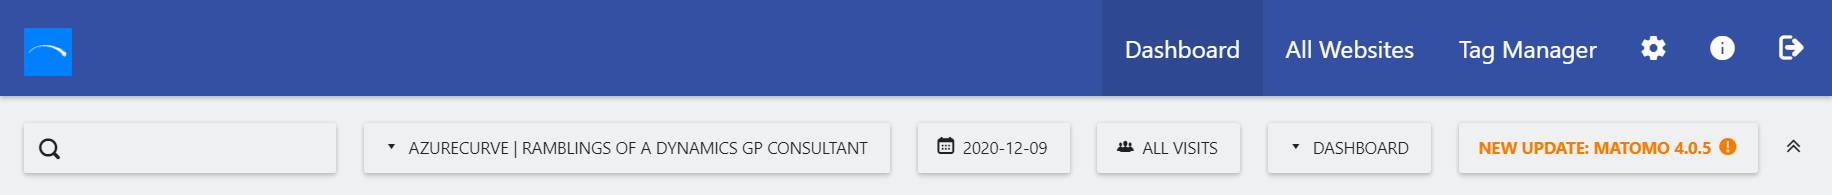 Matomo dashboard showing the update button